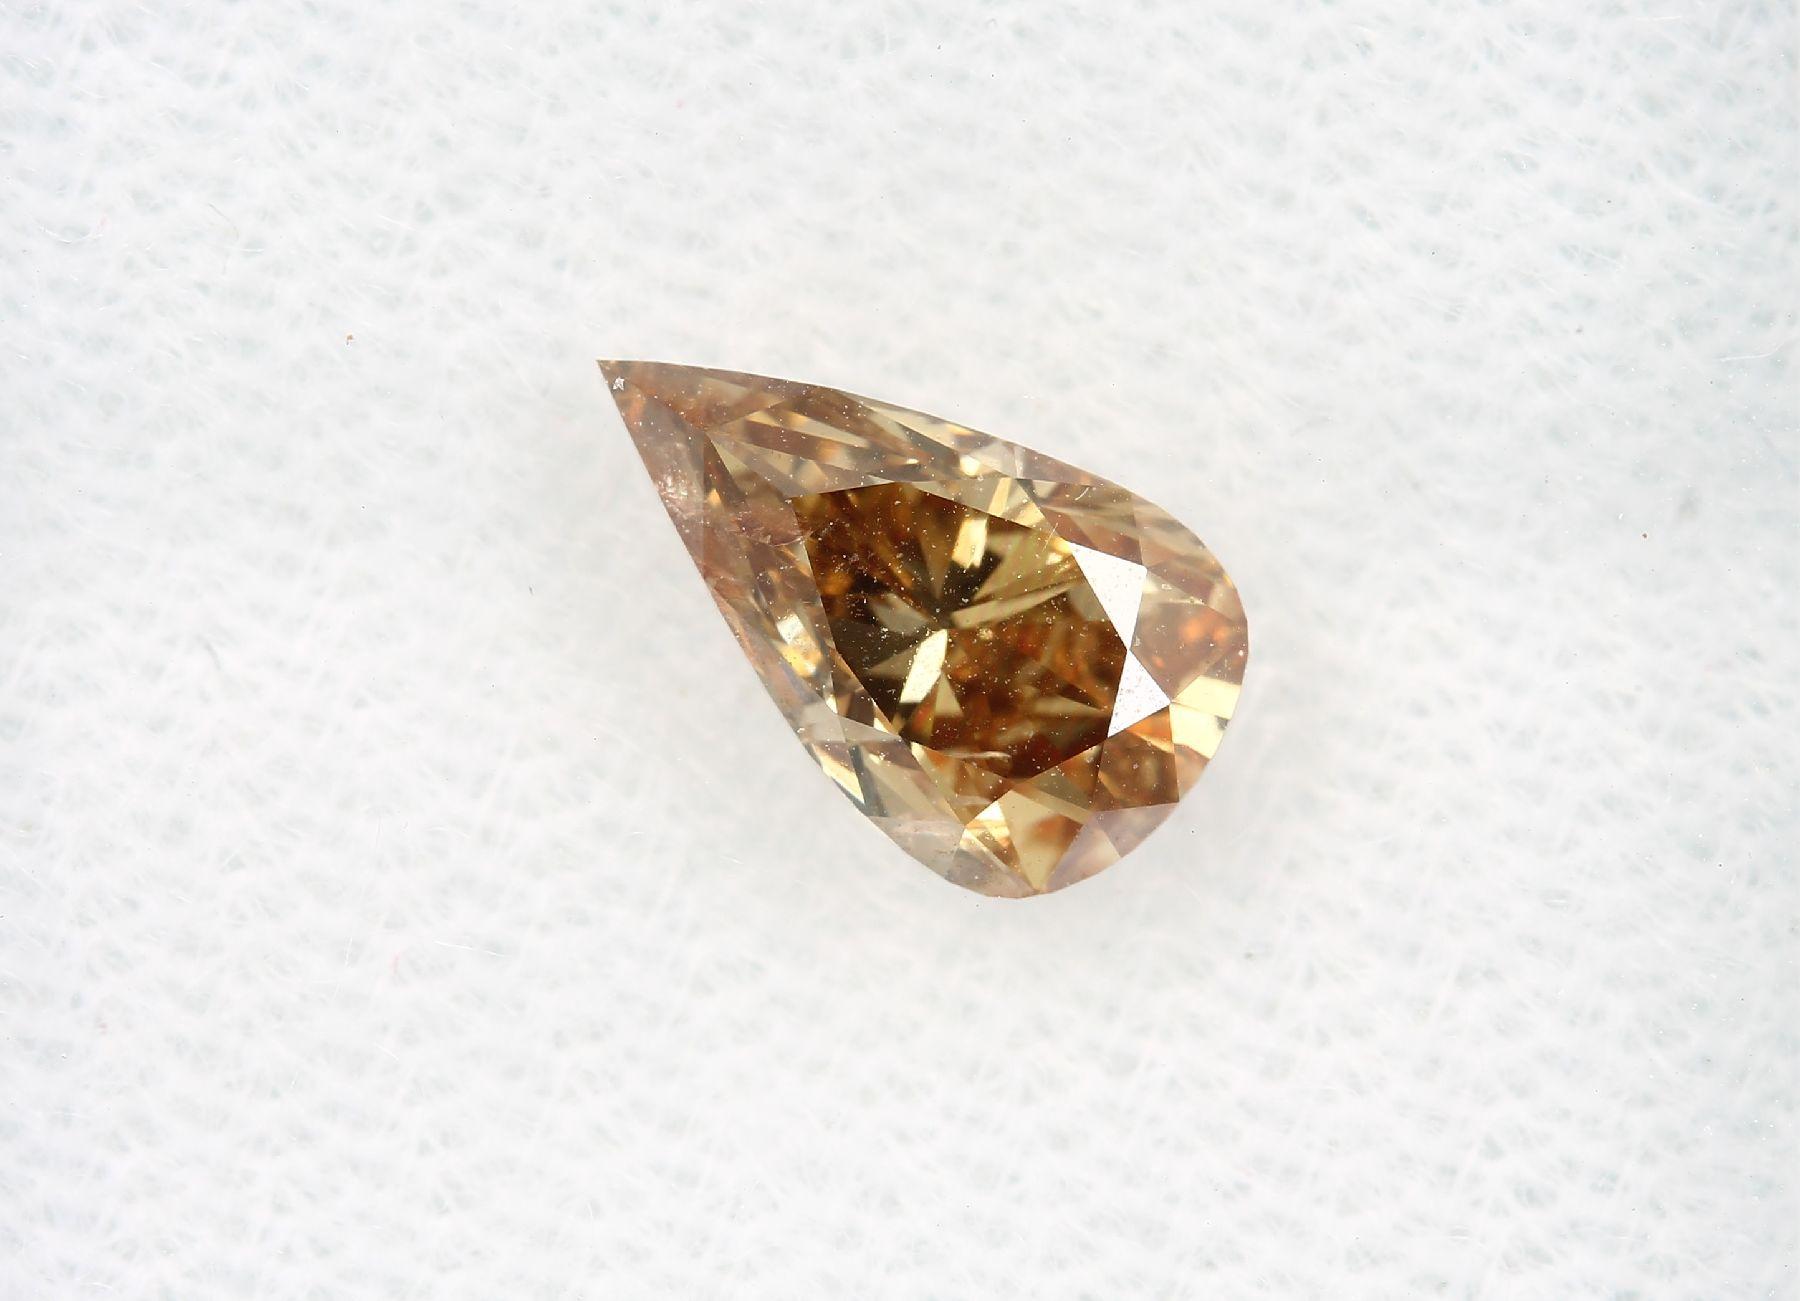 Loser Diamant, 1.01 ct Natural fancy deep brown-yellow, tropfenf. facett., 8.57 x 5.02 x 3.9 mm, mit